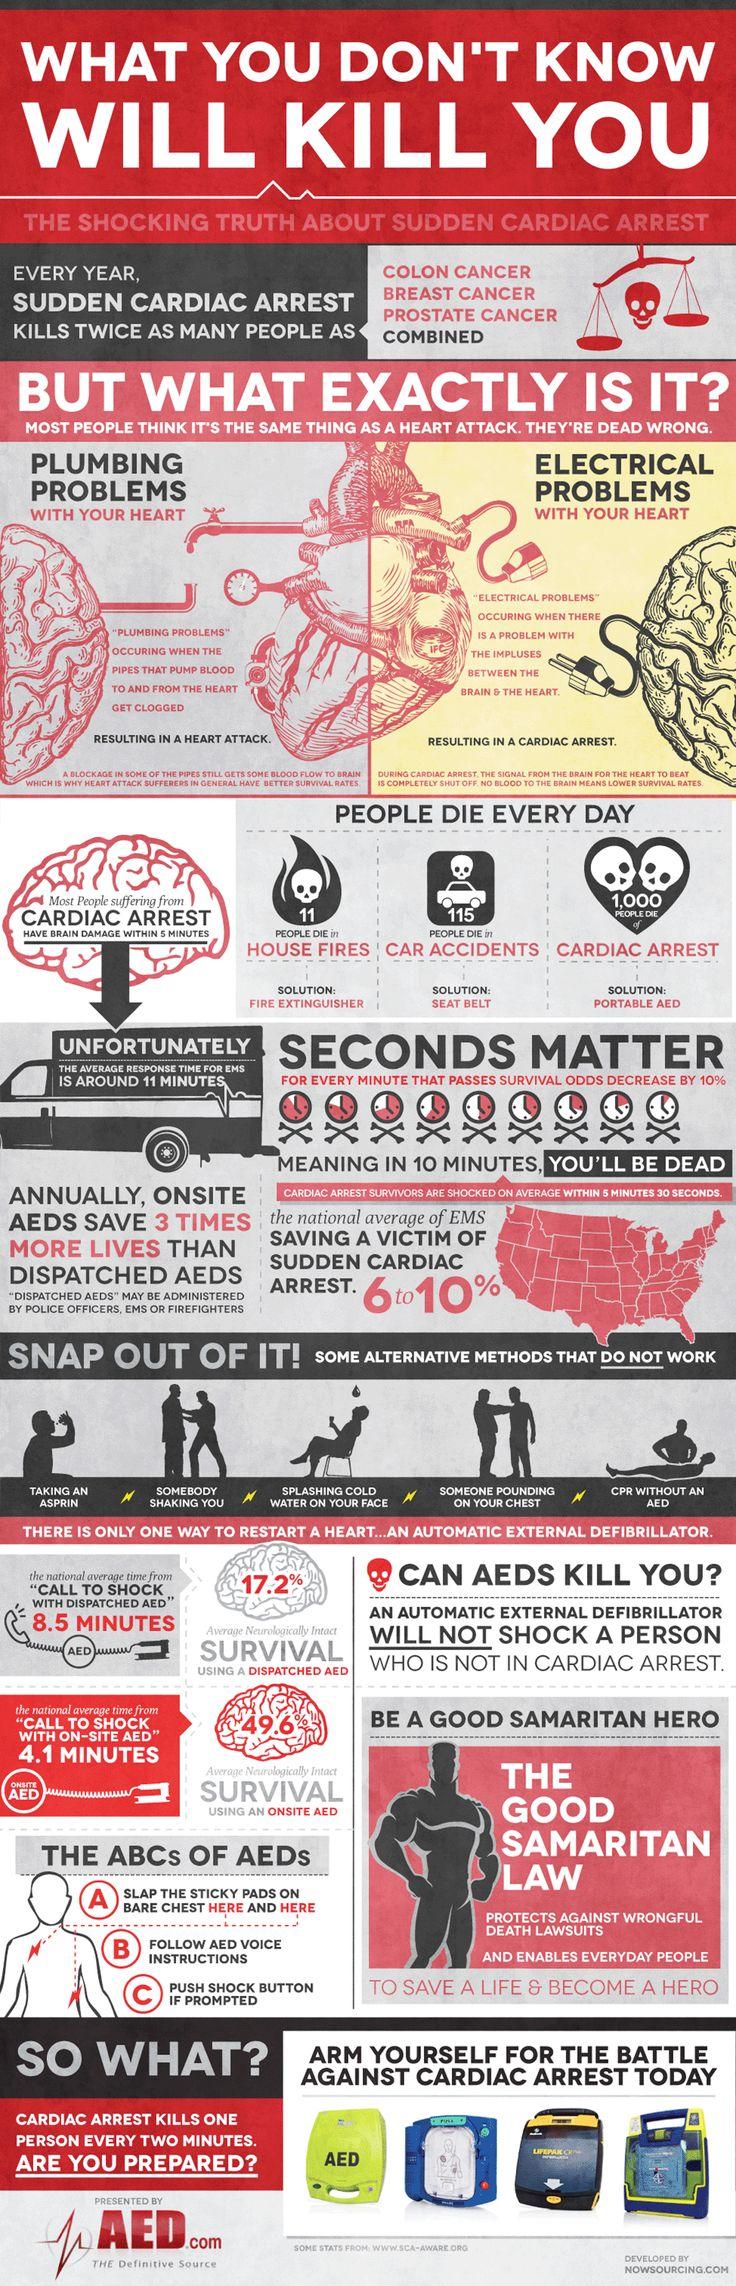 Afbeelding van http://www.coolinfographics.com/storage/post-images/cardiac-arrest-infographic.png?__SQUARESPACE_CACHEVERSION=1371397896288.